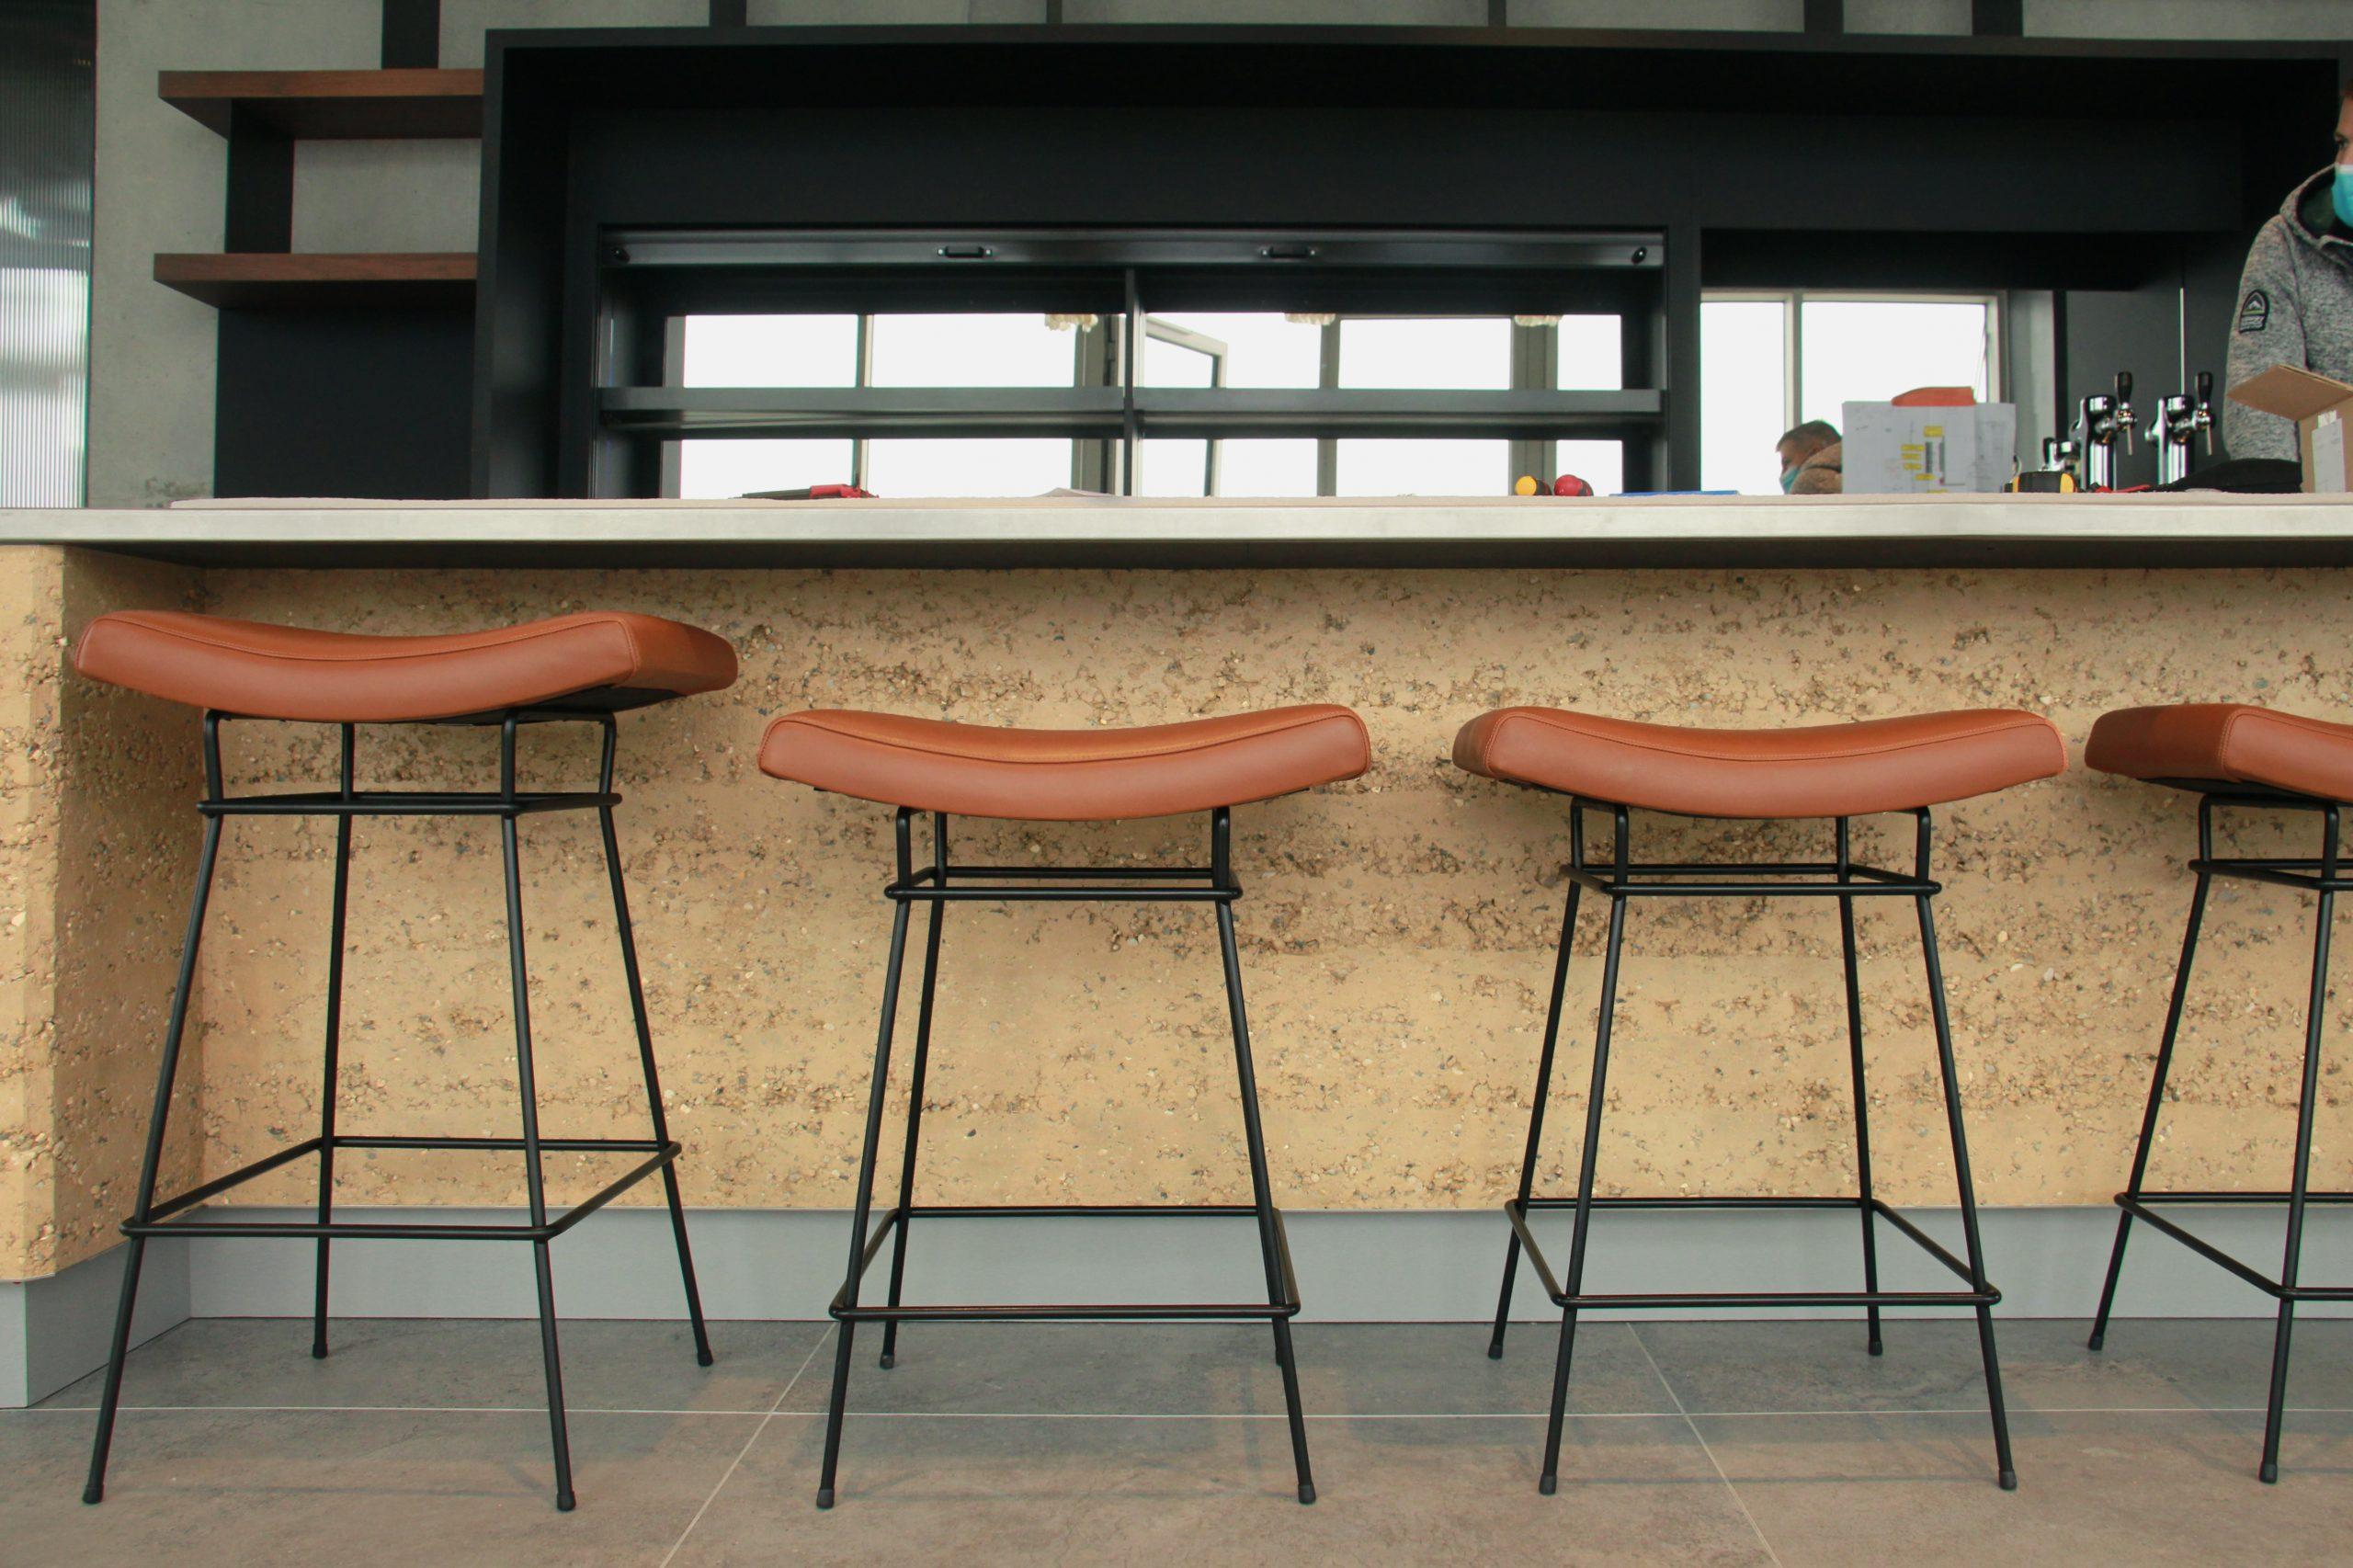 NOVOTEL Annemasse // Bars et desk en pisé